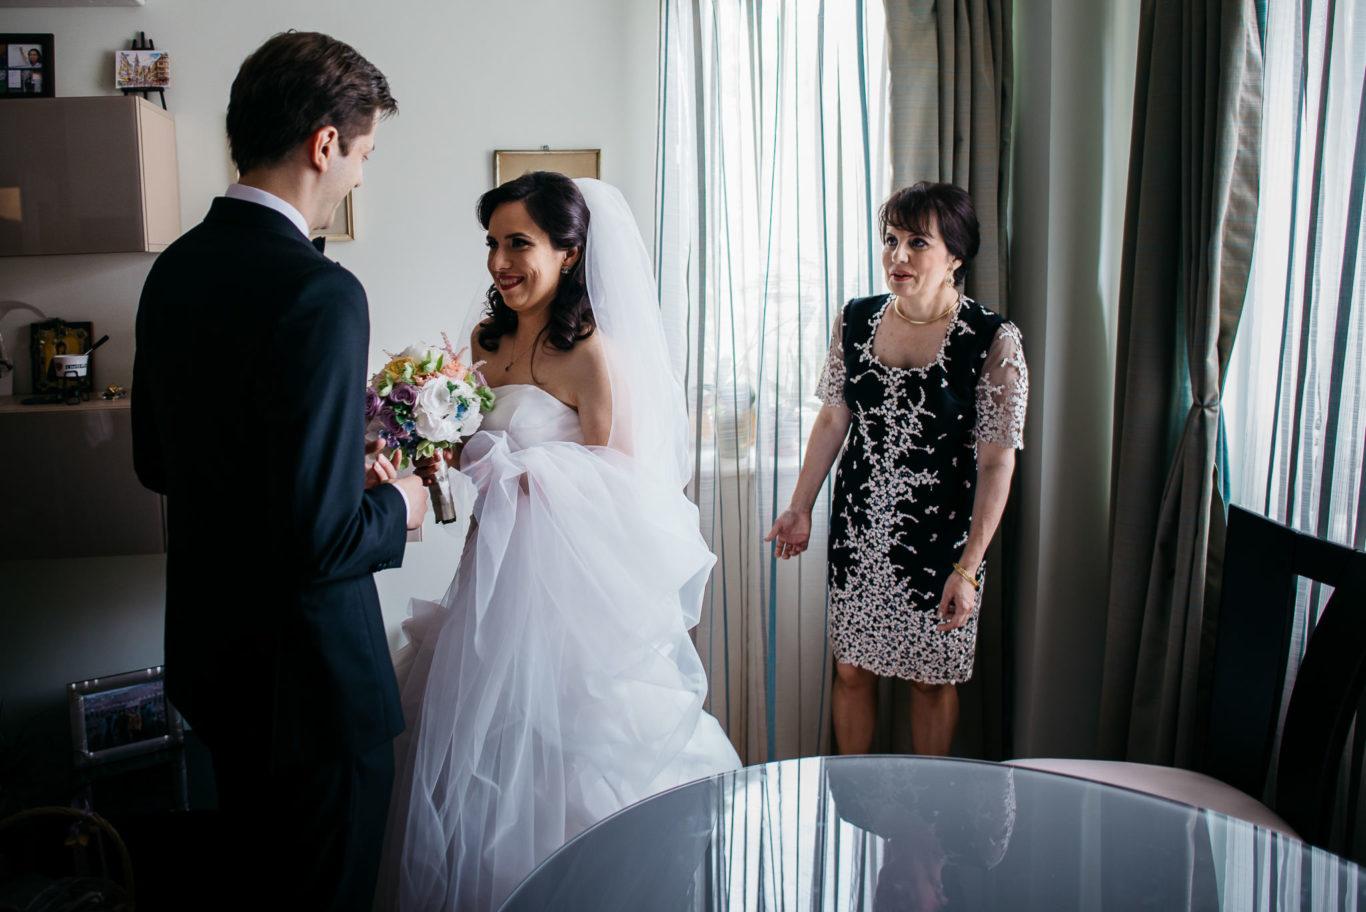 0307-Fotografie-nunta-Simona-Valentin-fotograf-Ciprian-Dumitrescu-DSC_1237